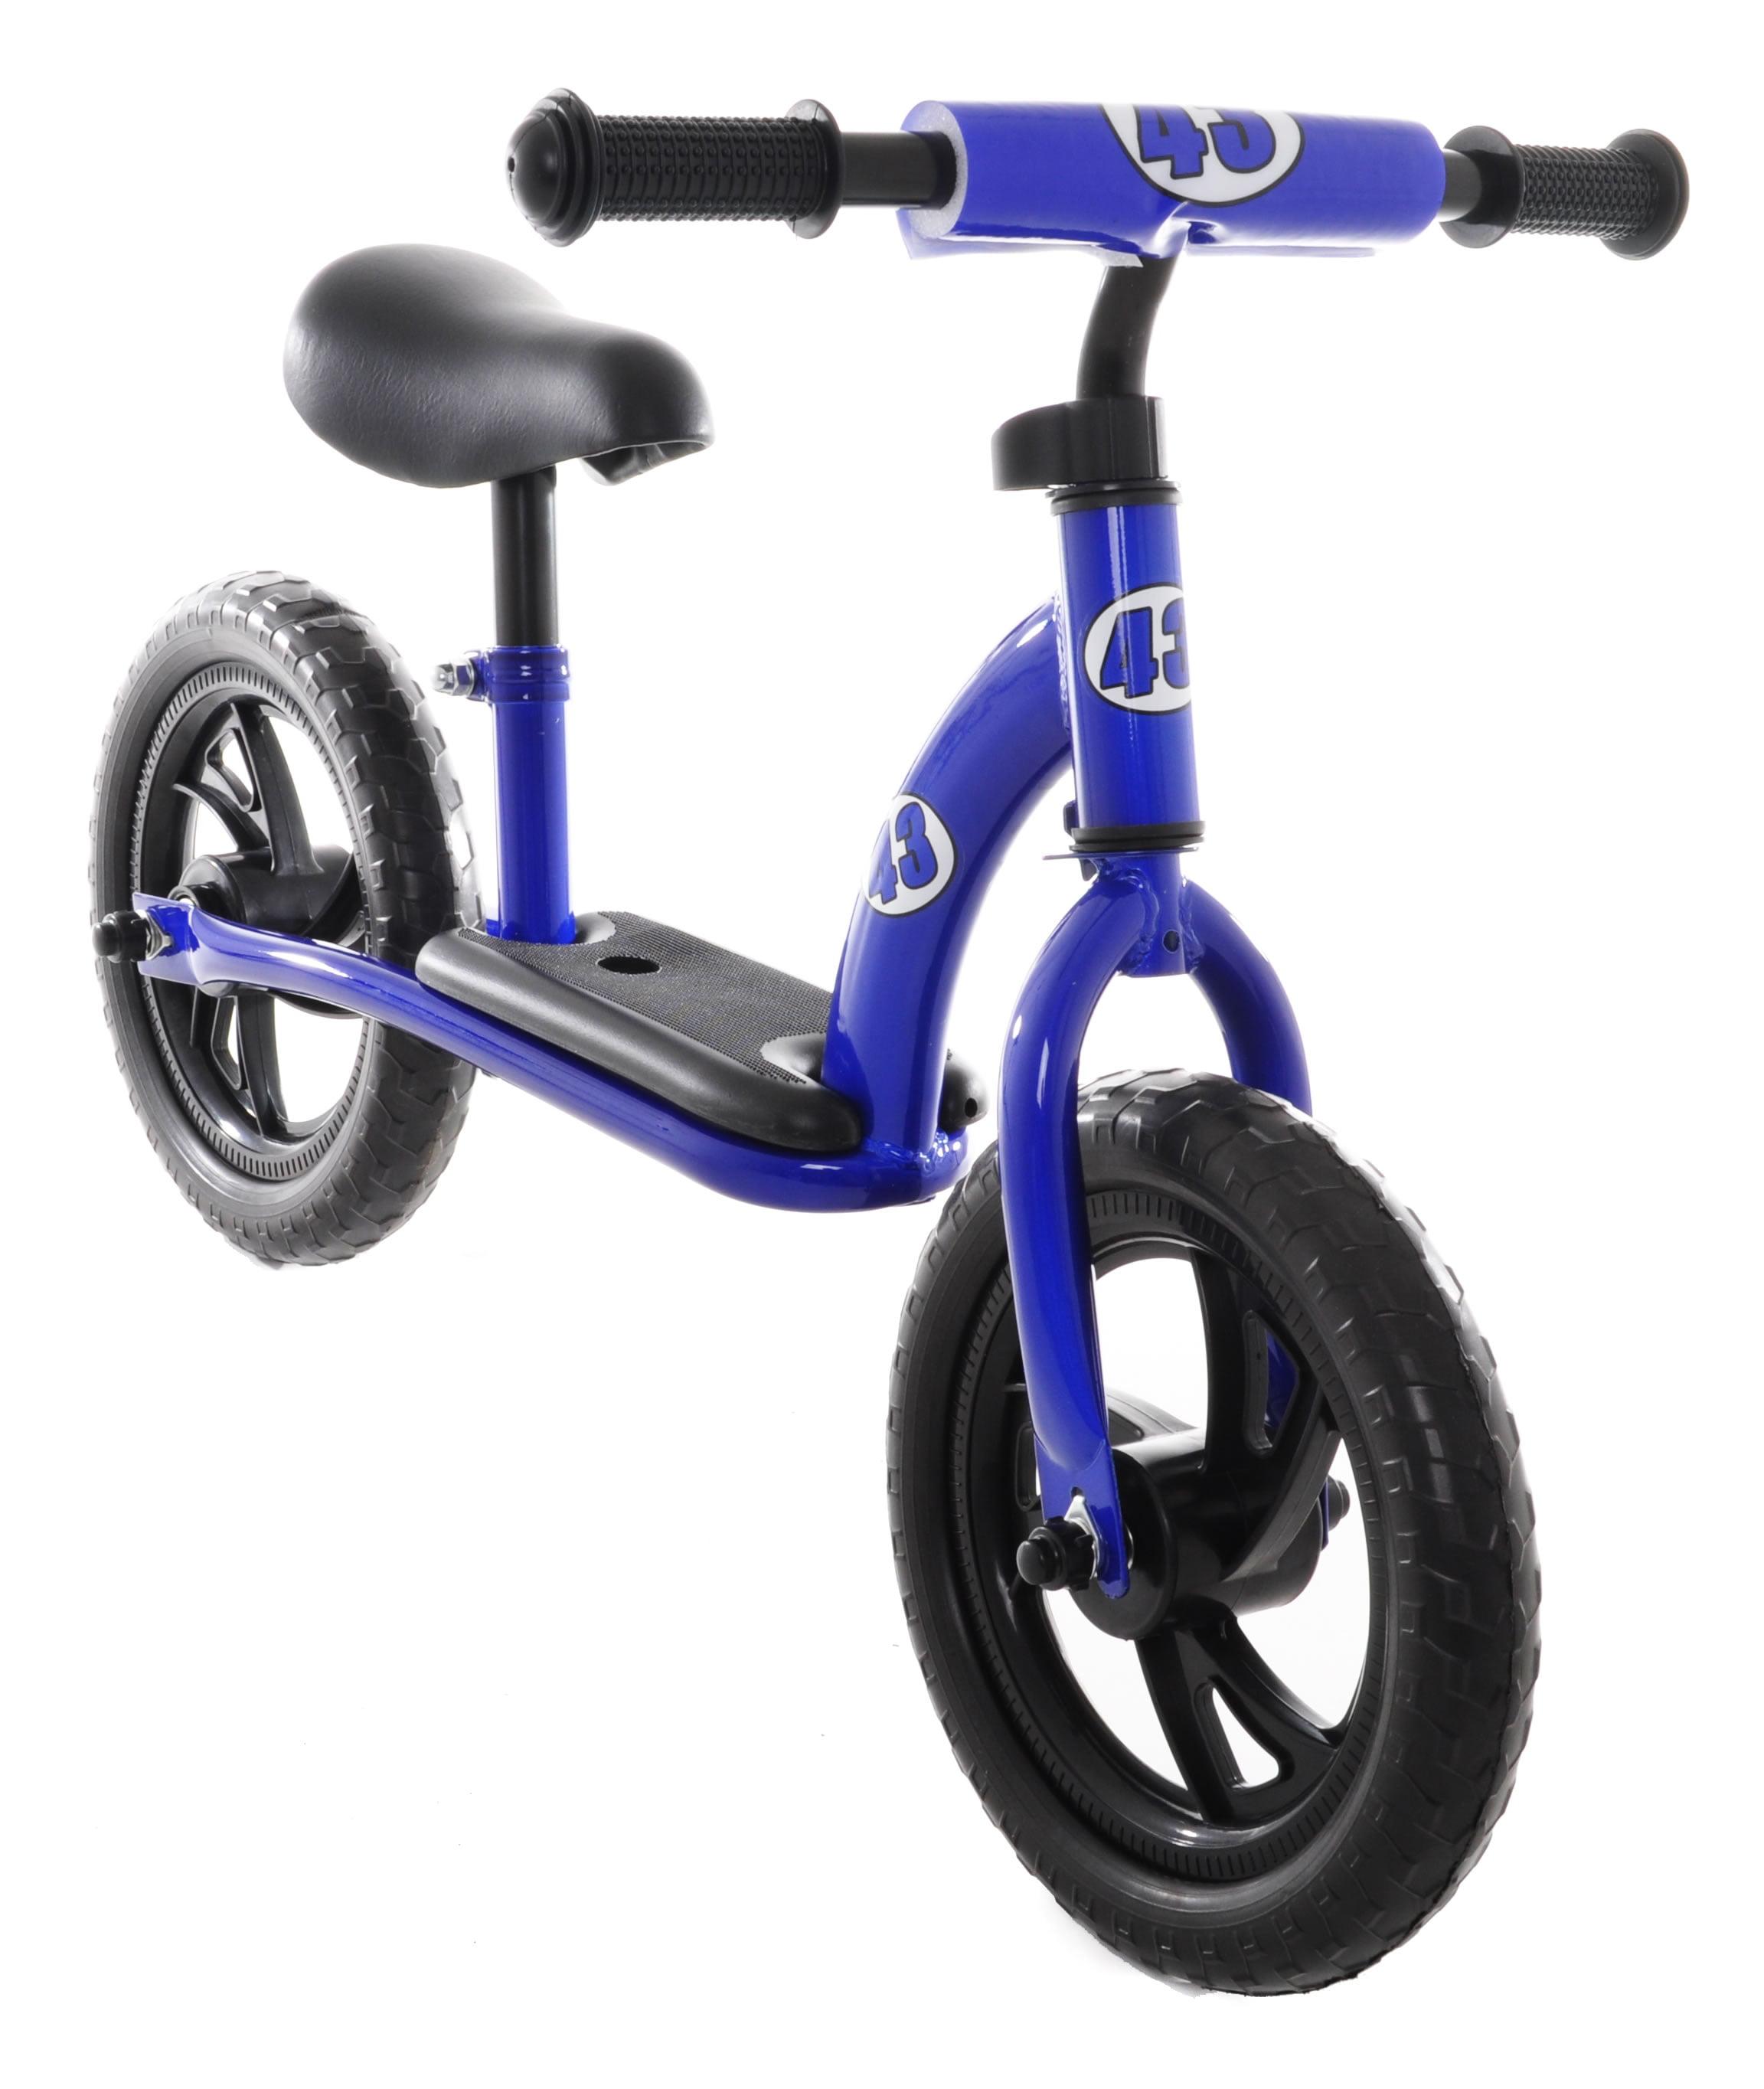 Vilano Ripper Balance Bike No Pedal Training Bicycle by Vilano